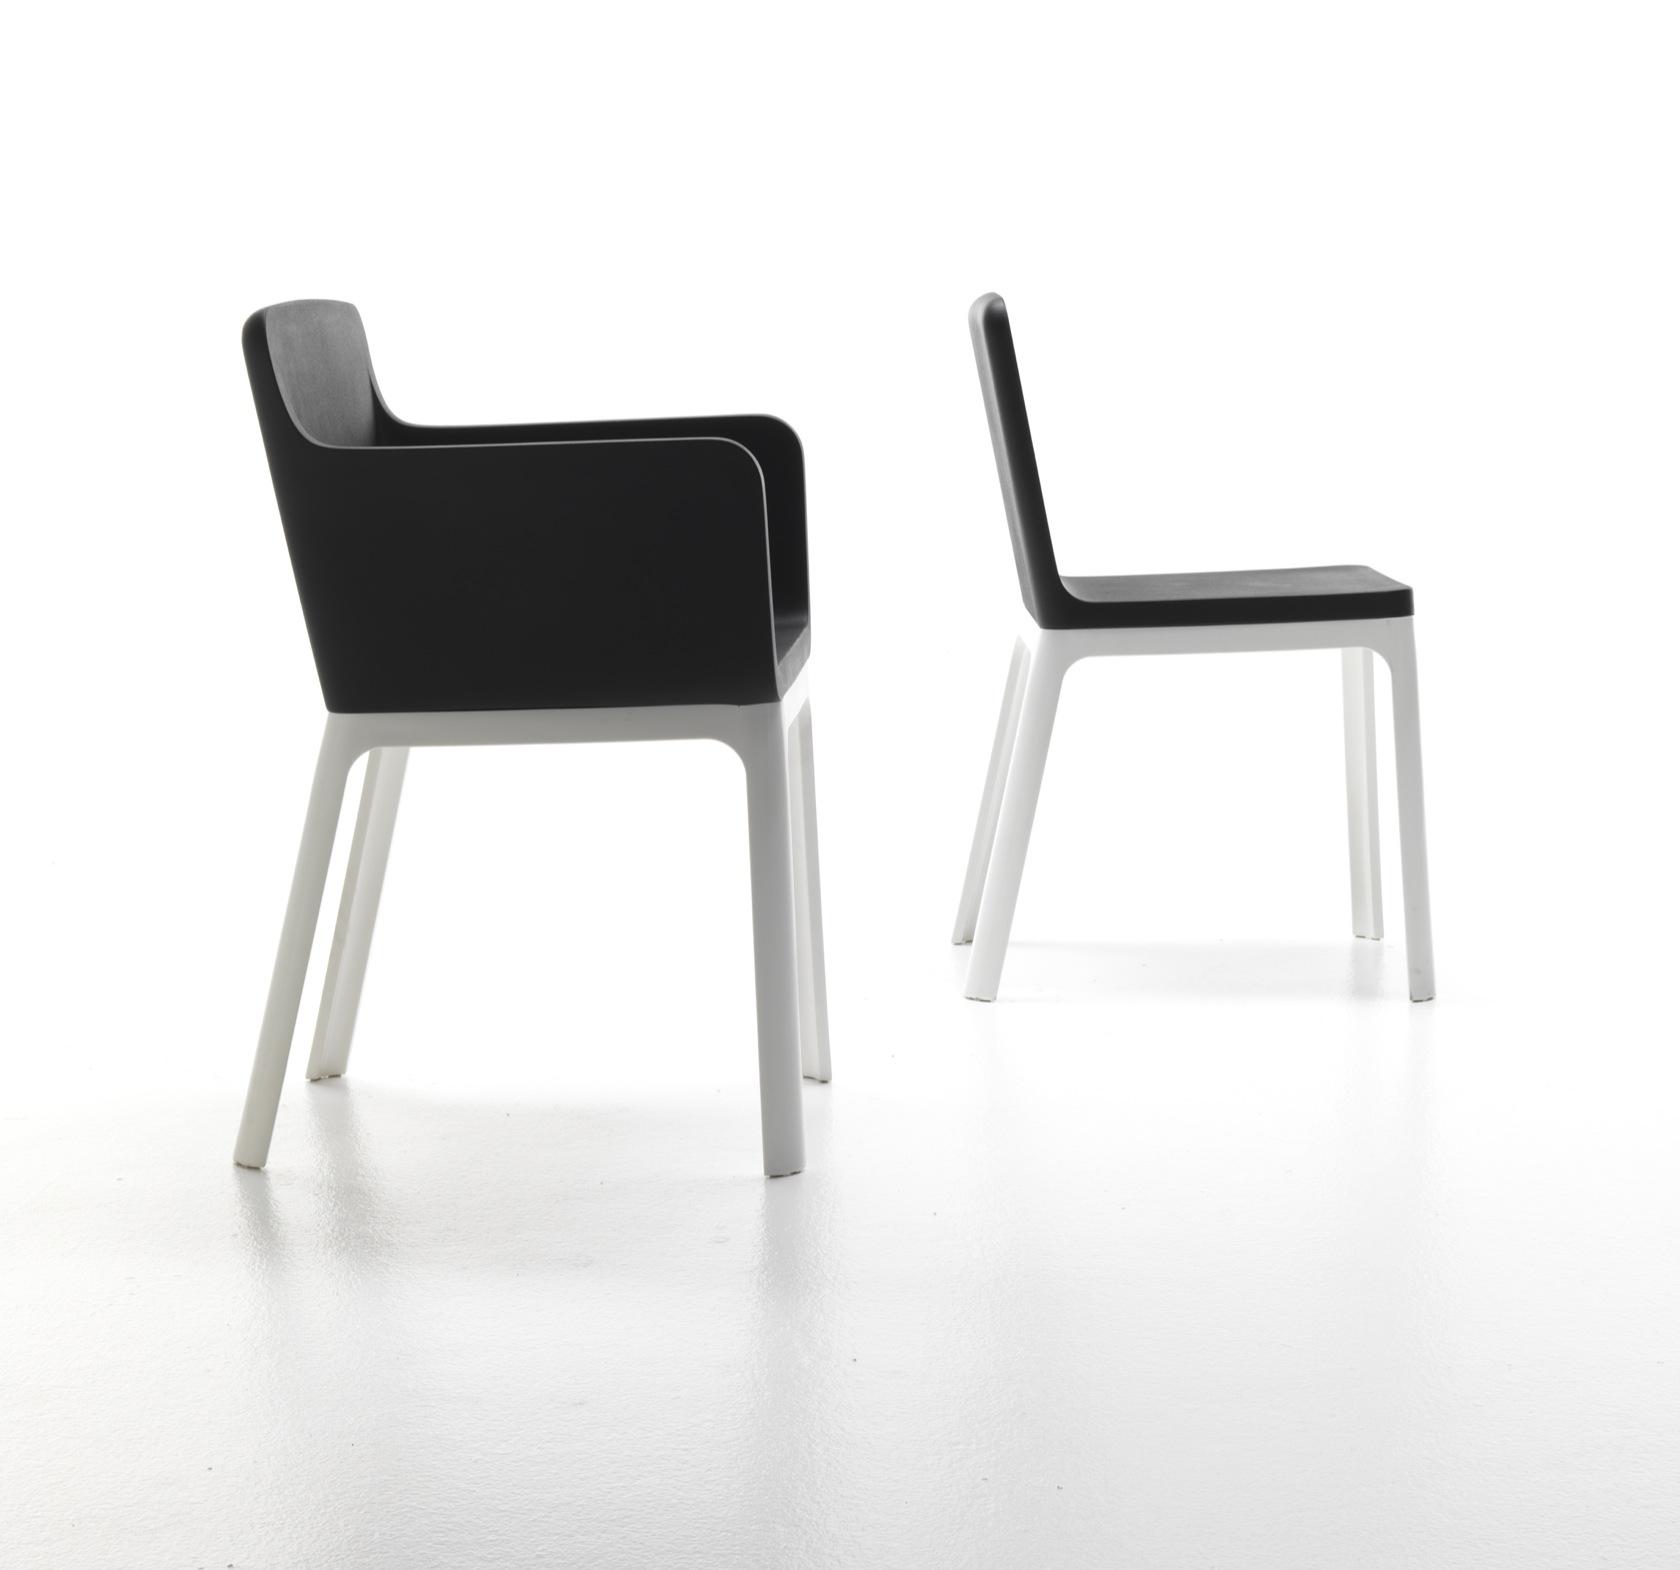 Half-Half chairs